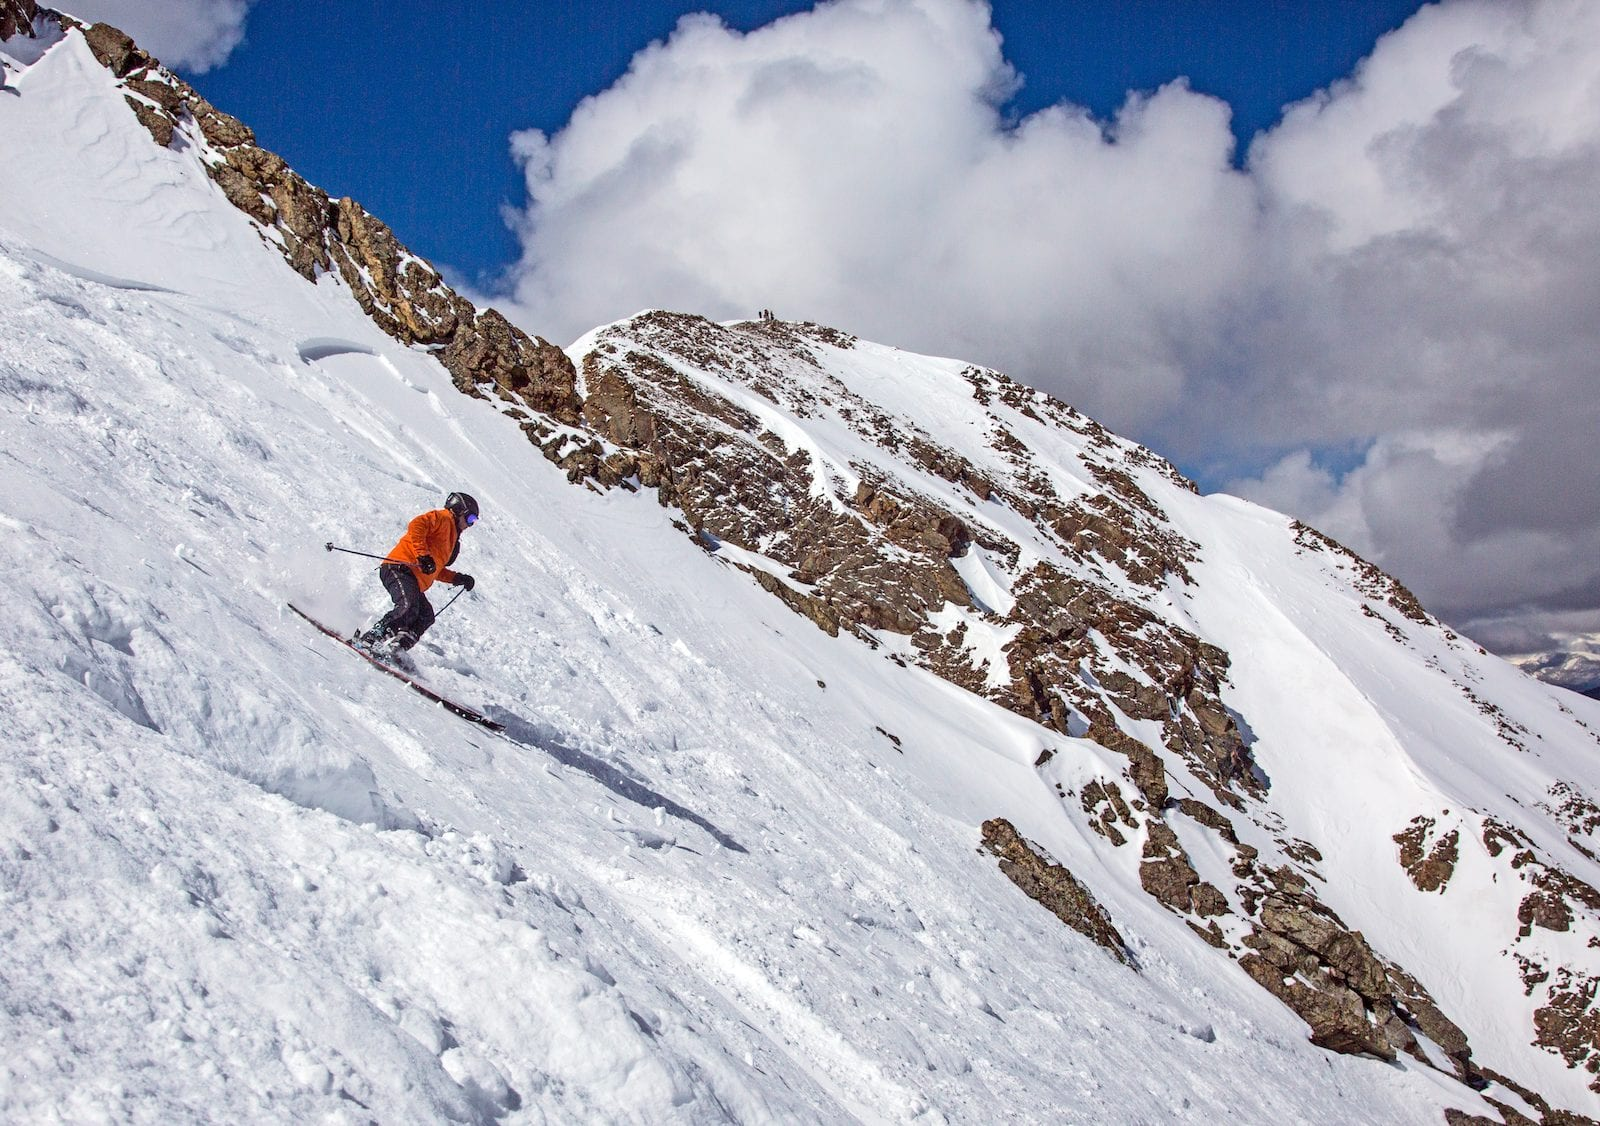 Arapahoe Basin Ski Resort, Colorado